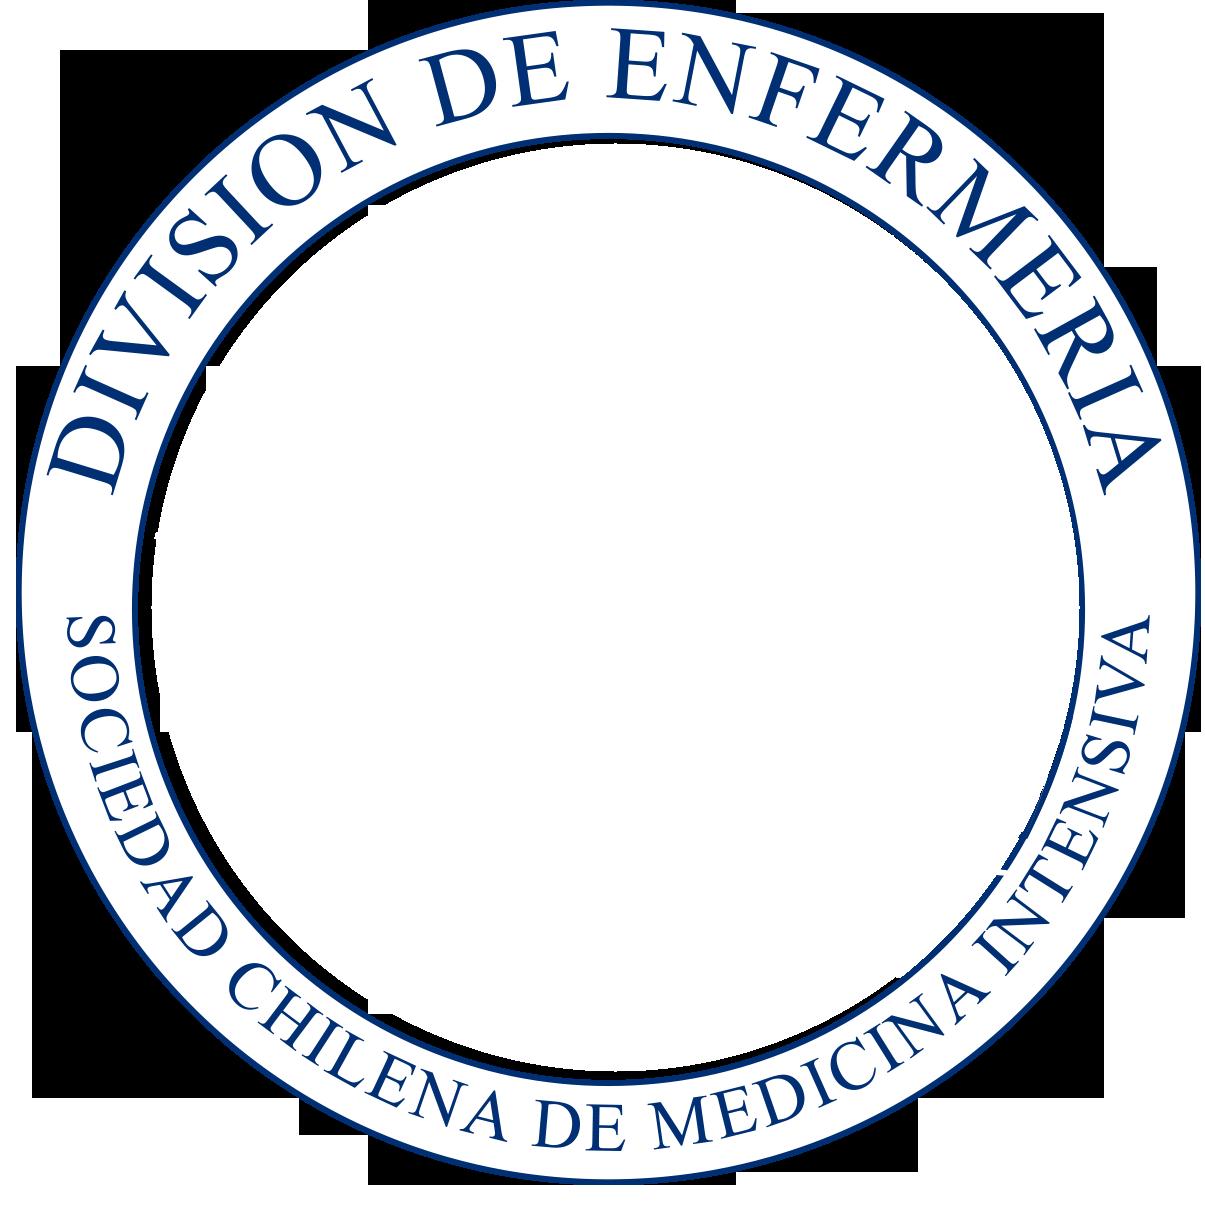 36 Congreso Chileno de Medicina Intensiva